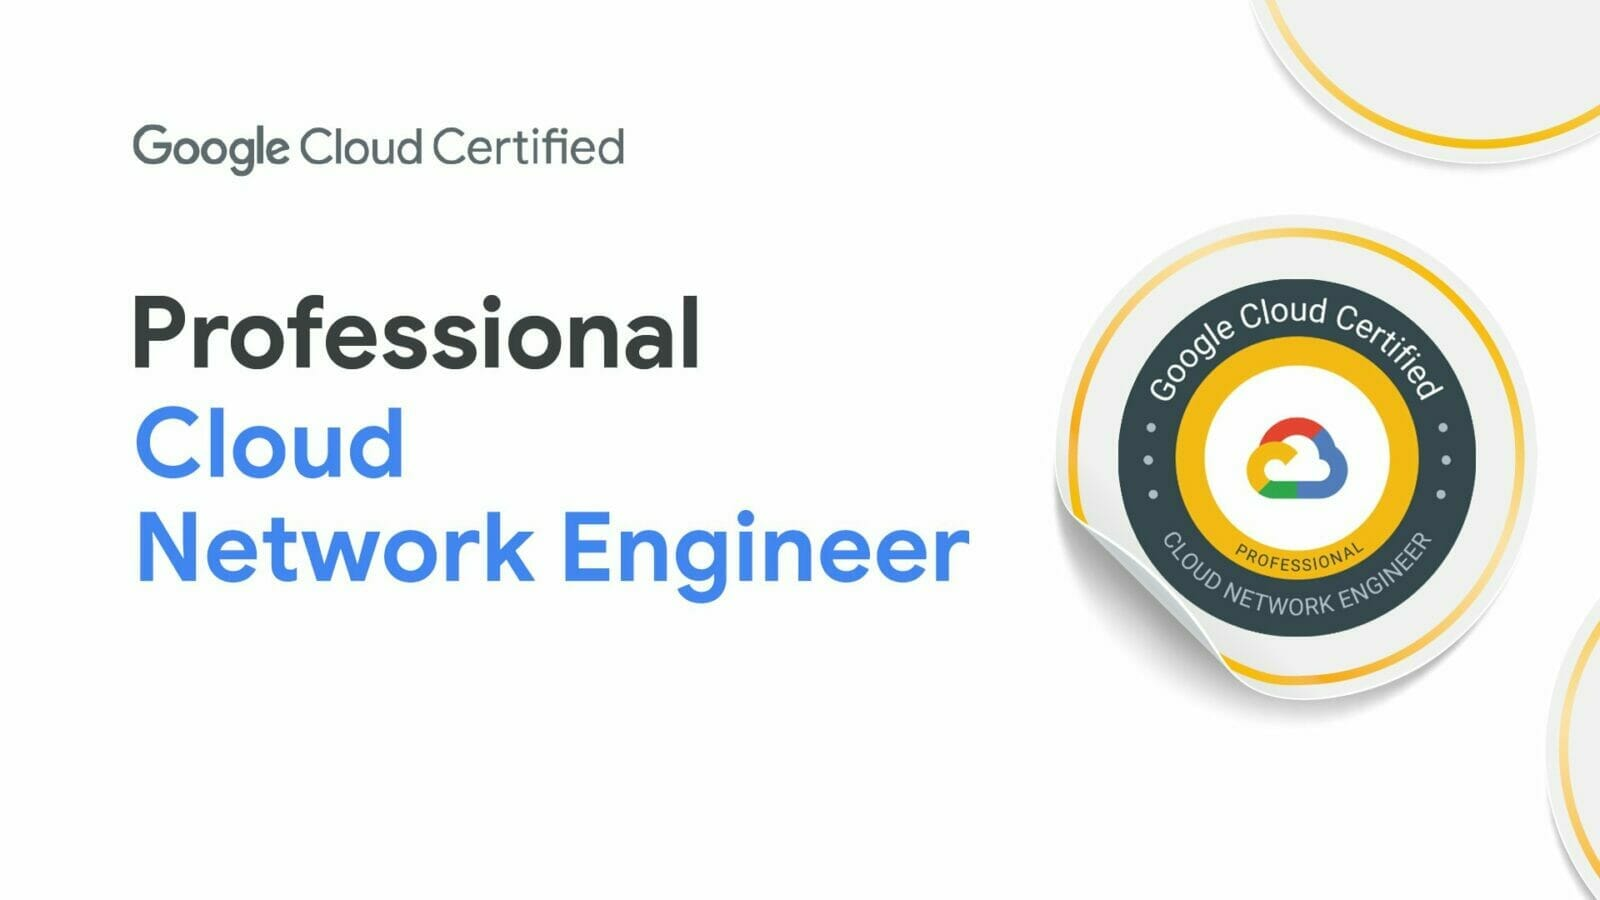 Google Cloud Certified - Professional Cloud Network Engineer 認定資格バッジ